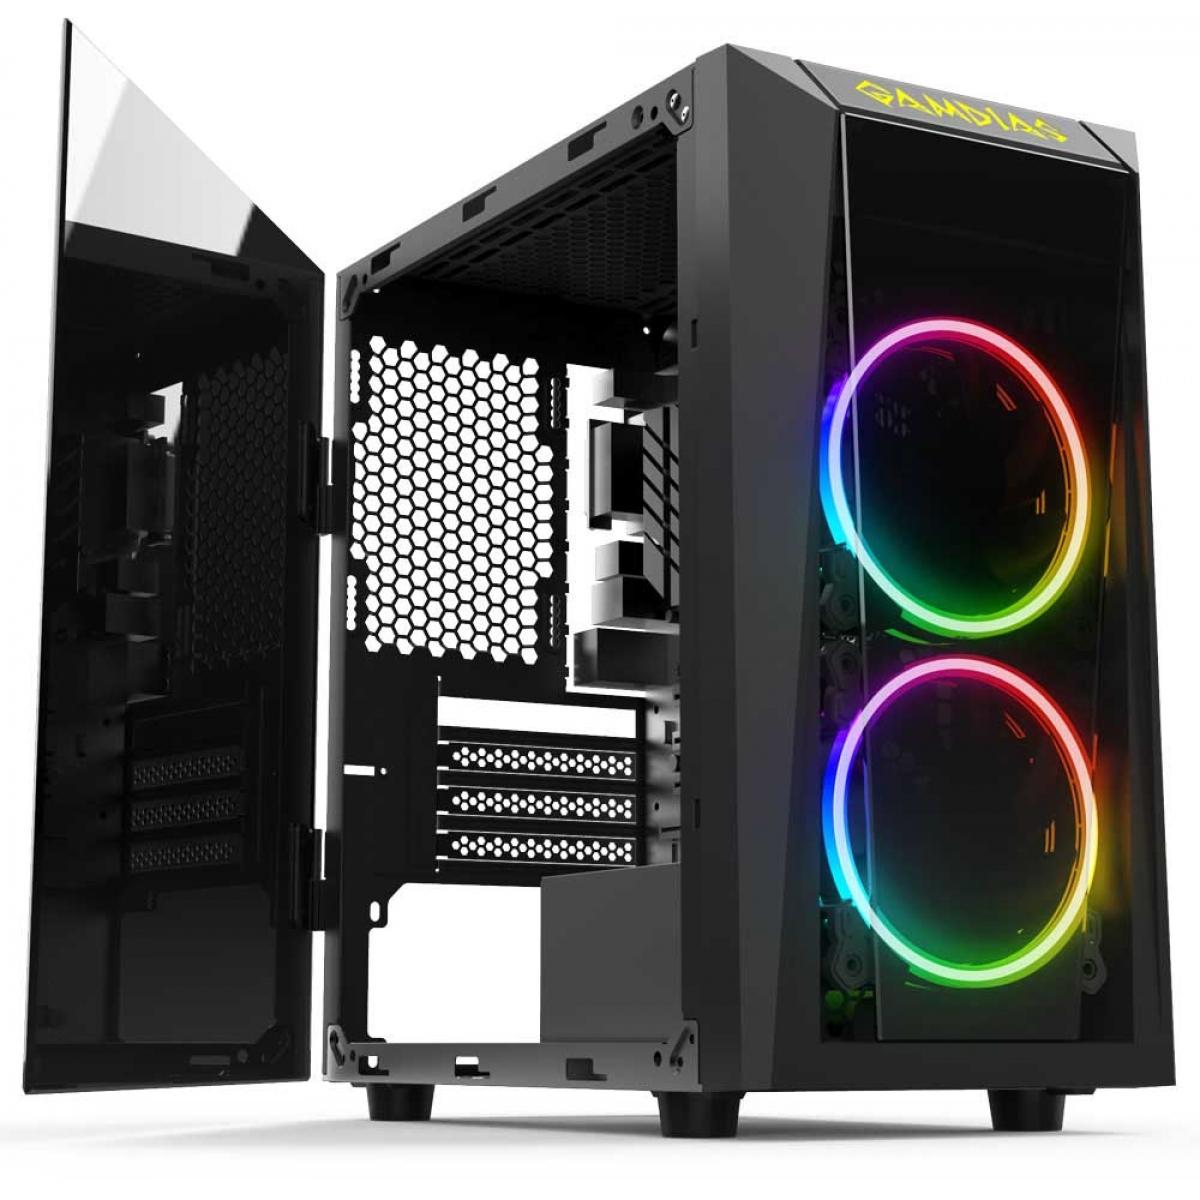 Gabinete Gamer Gamdias Talos E1, Mid Tower, Com 2 Fans RGB, Vidro Temperado, Black, S-fonte